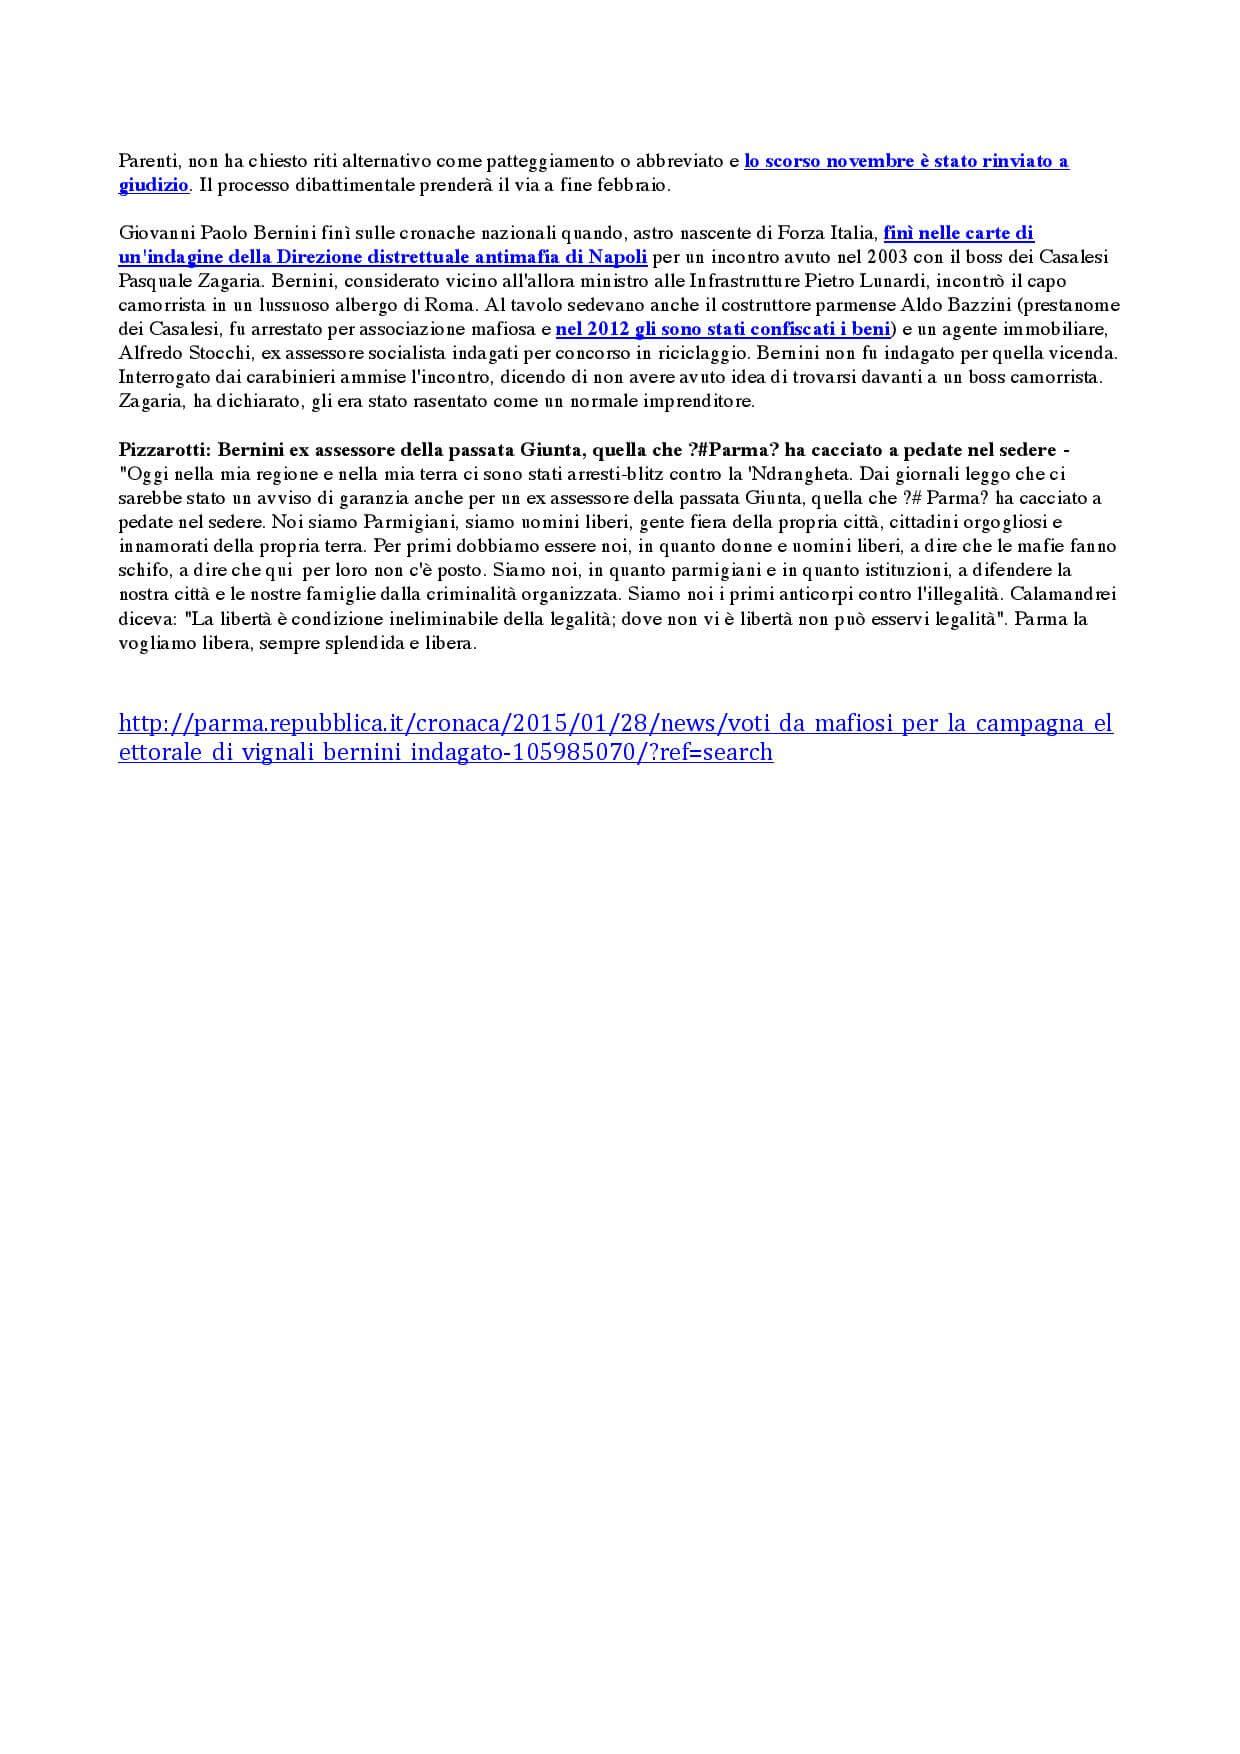 28_1_15_rit_bernini-page-002